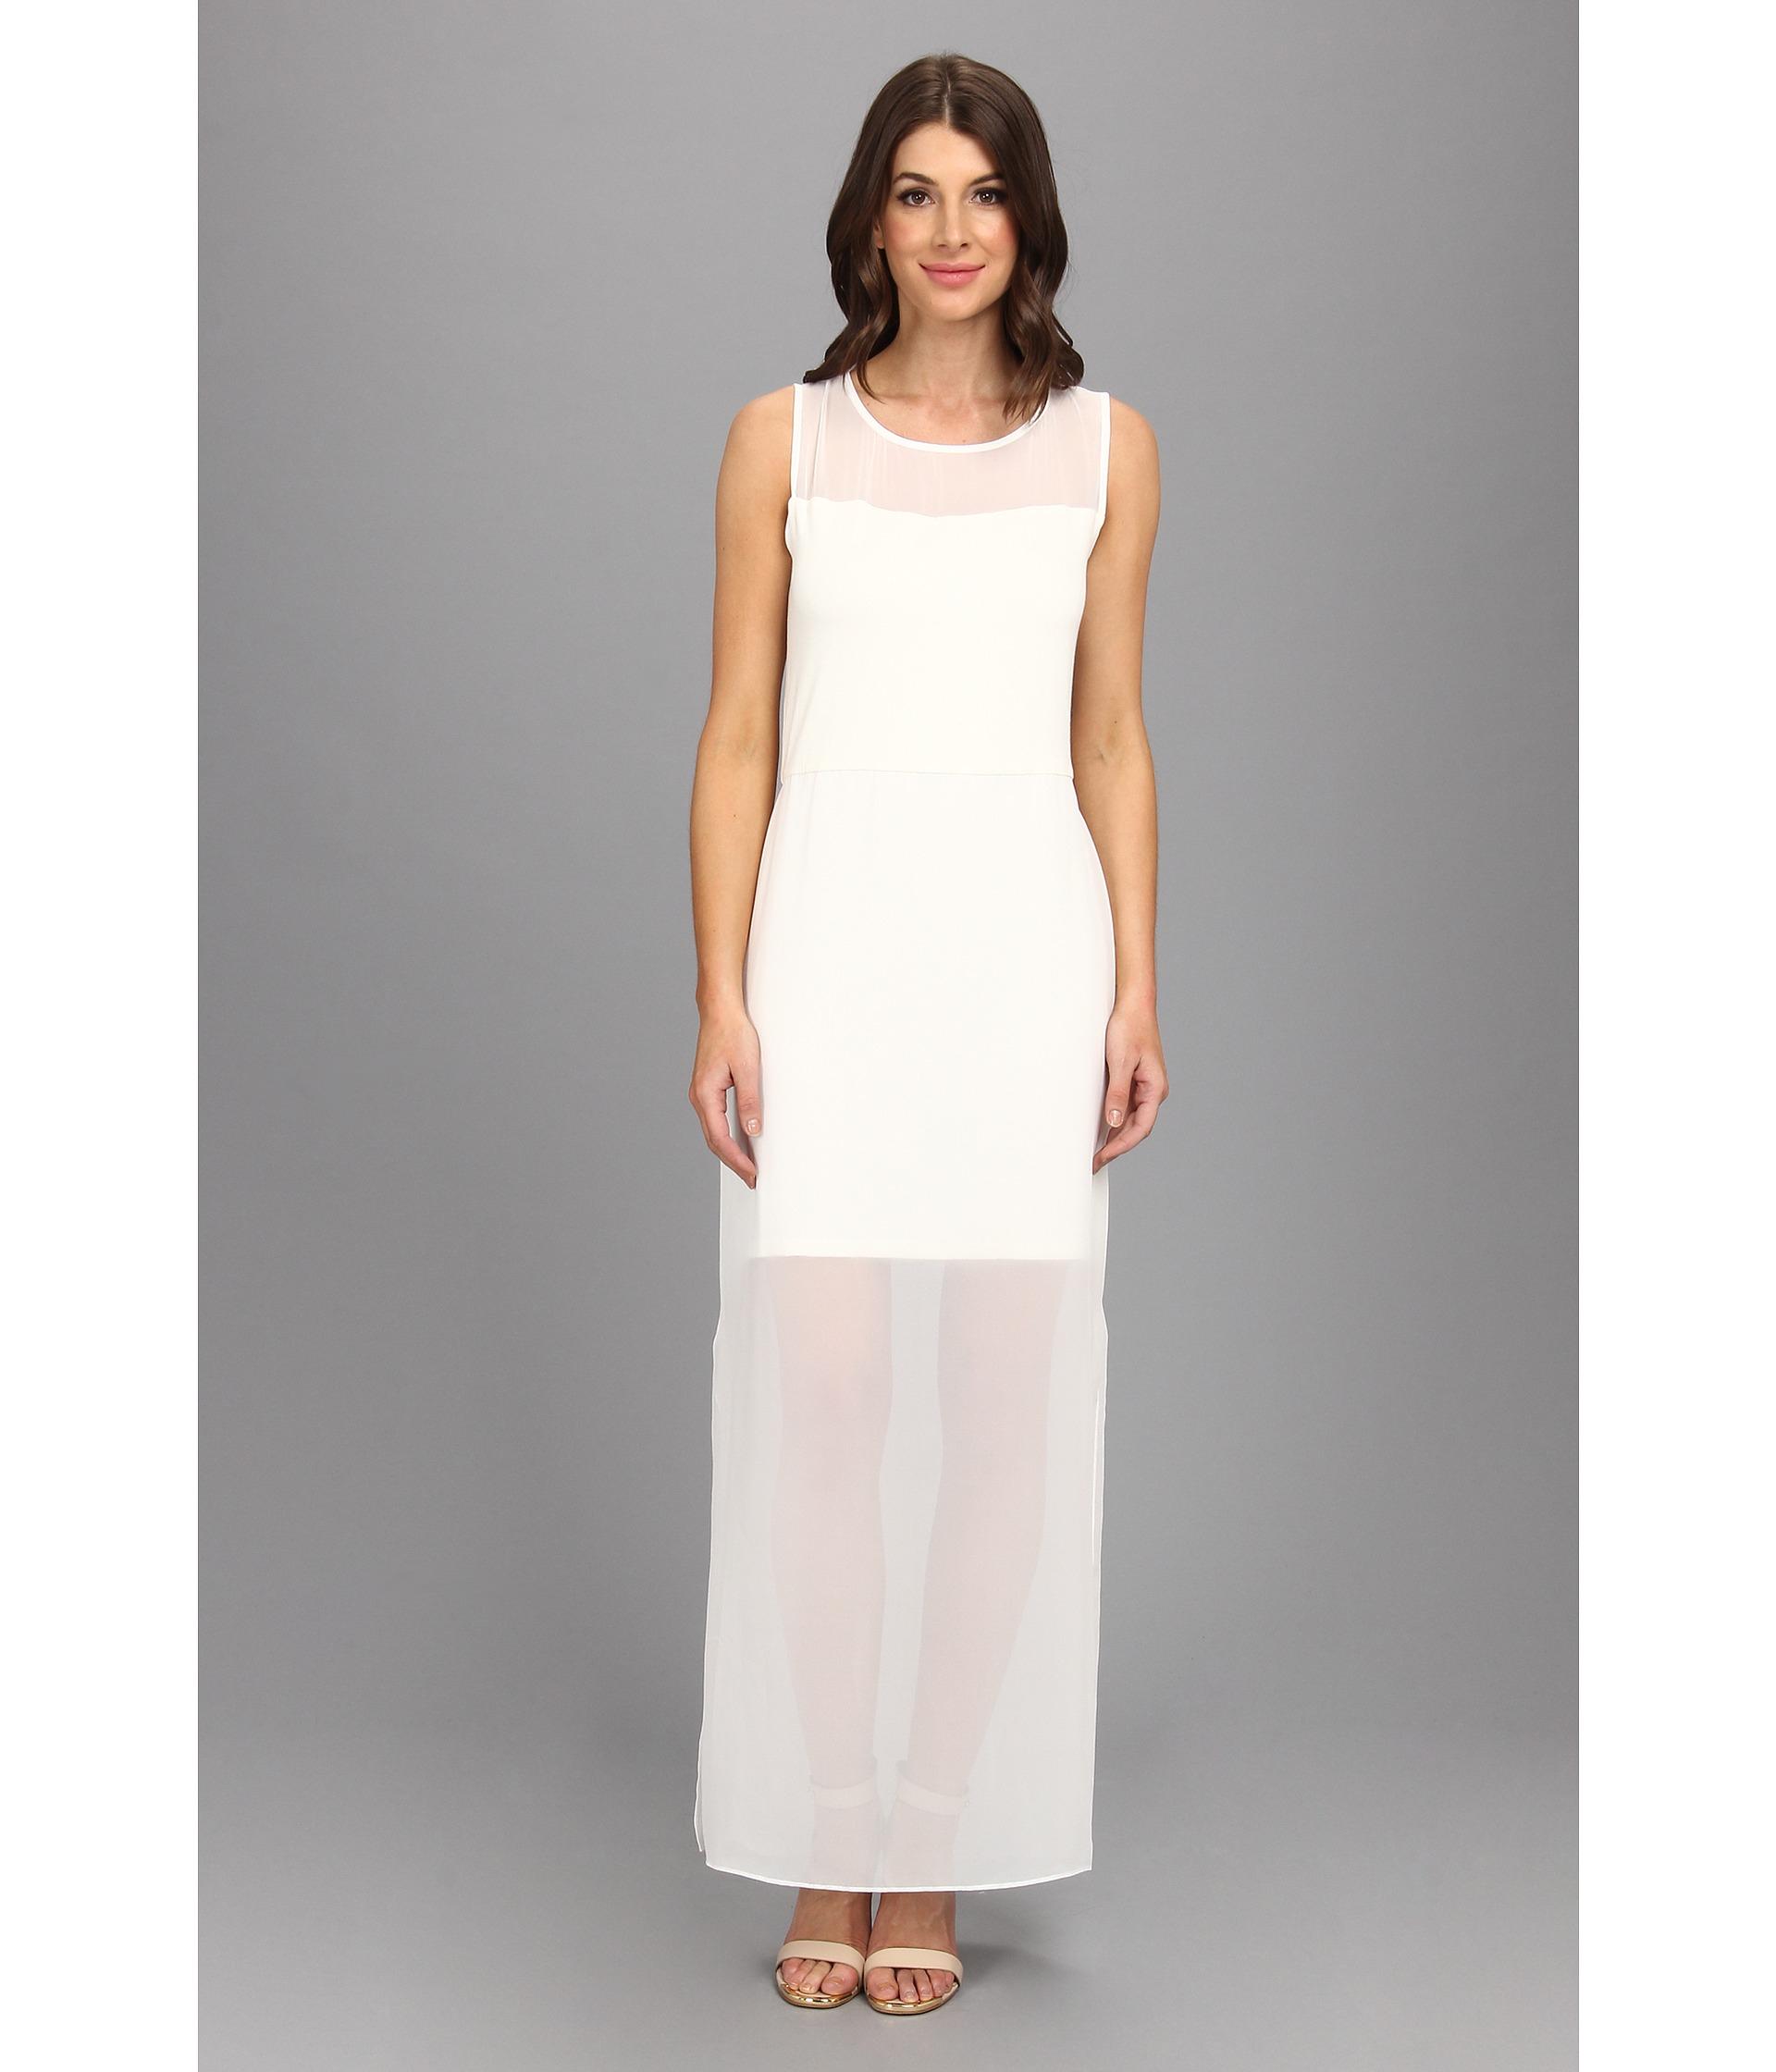 Vince Camuto Chiffon Overlay Dress